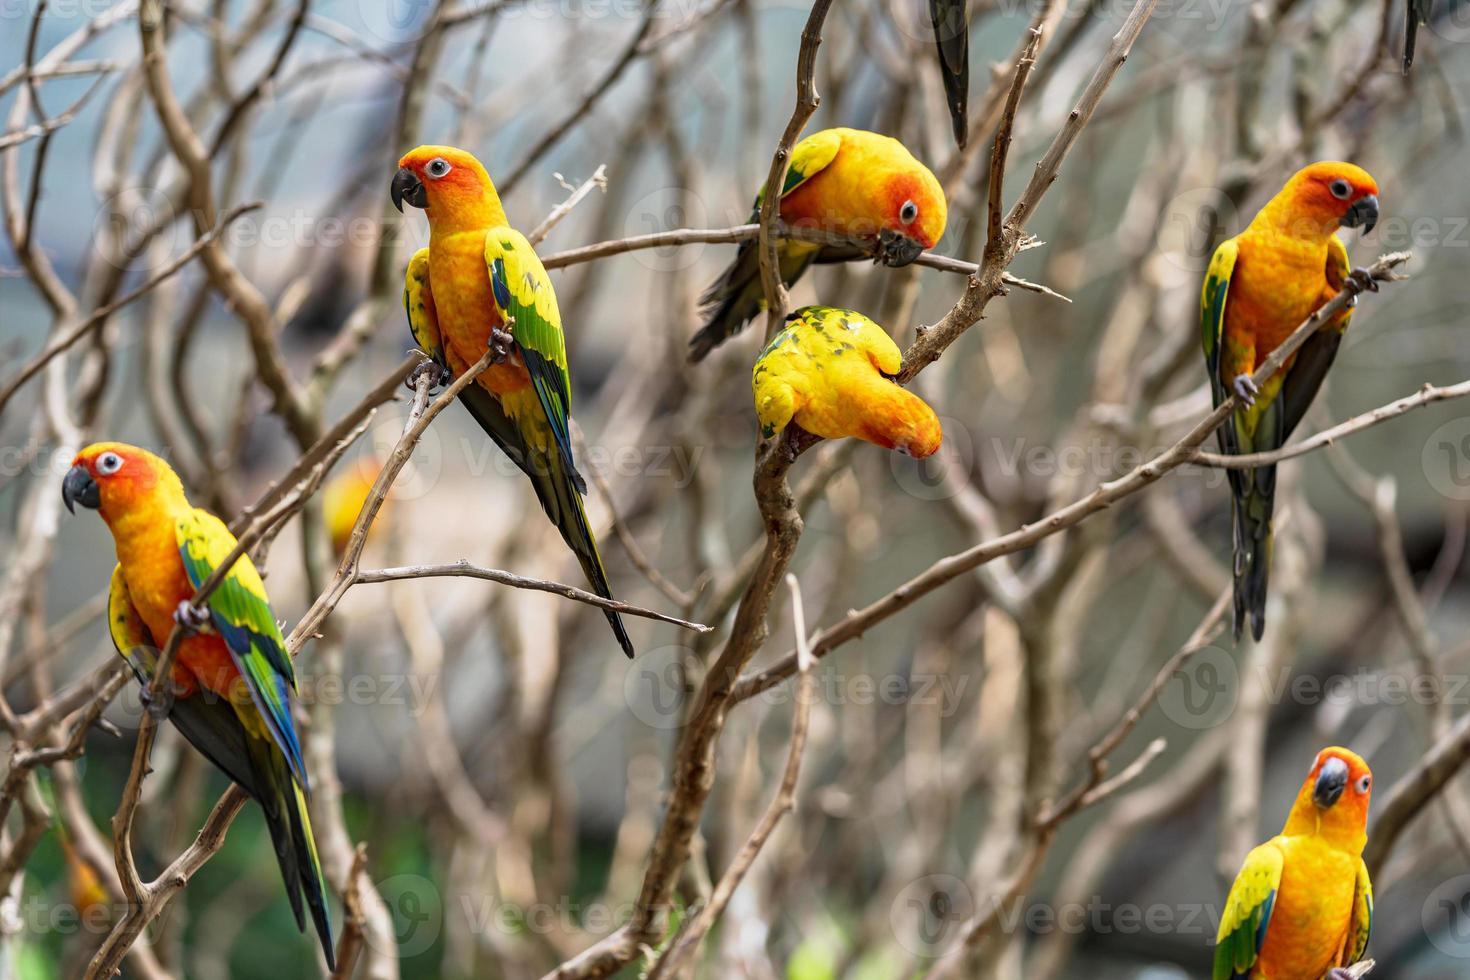 papagaios conure sol em galhos de árvores foto